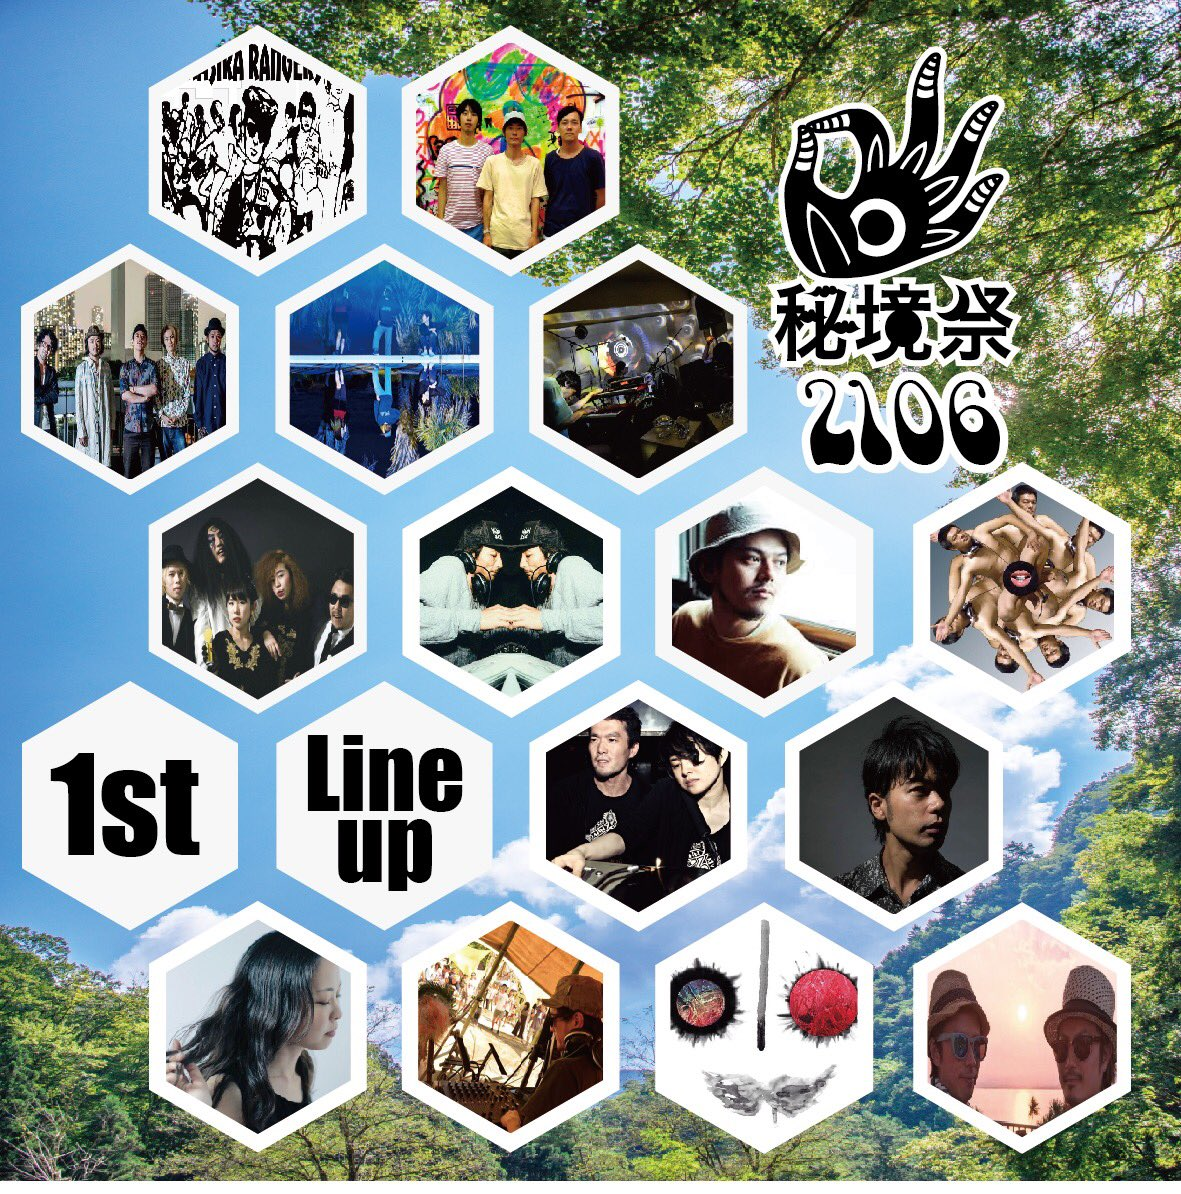 ⚡︎⚡︎⚡︎秘境祭2016第1弾lineup⚡︎⚡︎⚡︎  ◆LIVE Magic,Drums&Love MUFF NETWORKS Pepe California Tempalay 井の頭レンジャーズ  ニーハオ!ドラびでお! https://t.co/cqL390MGWS